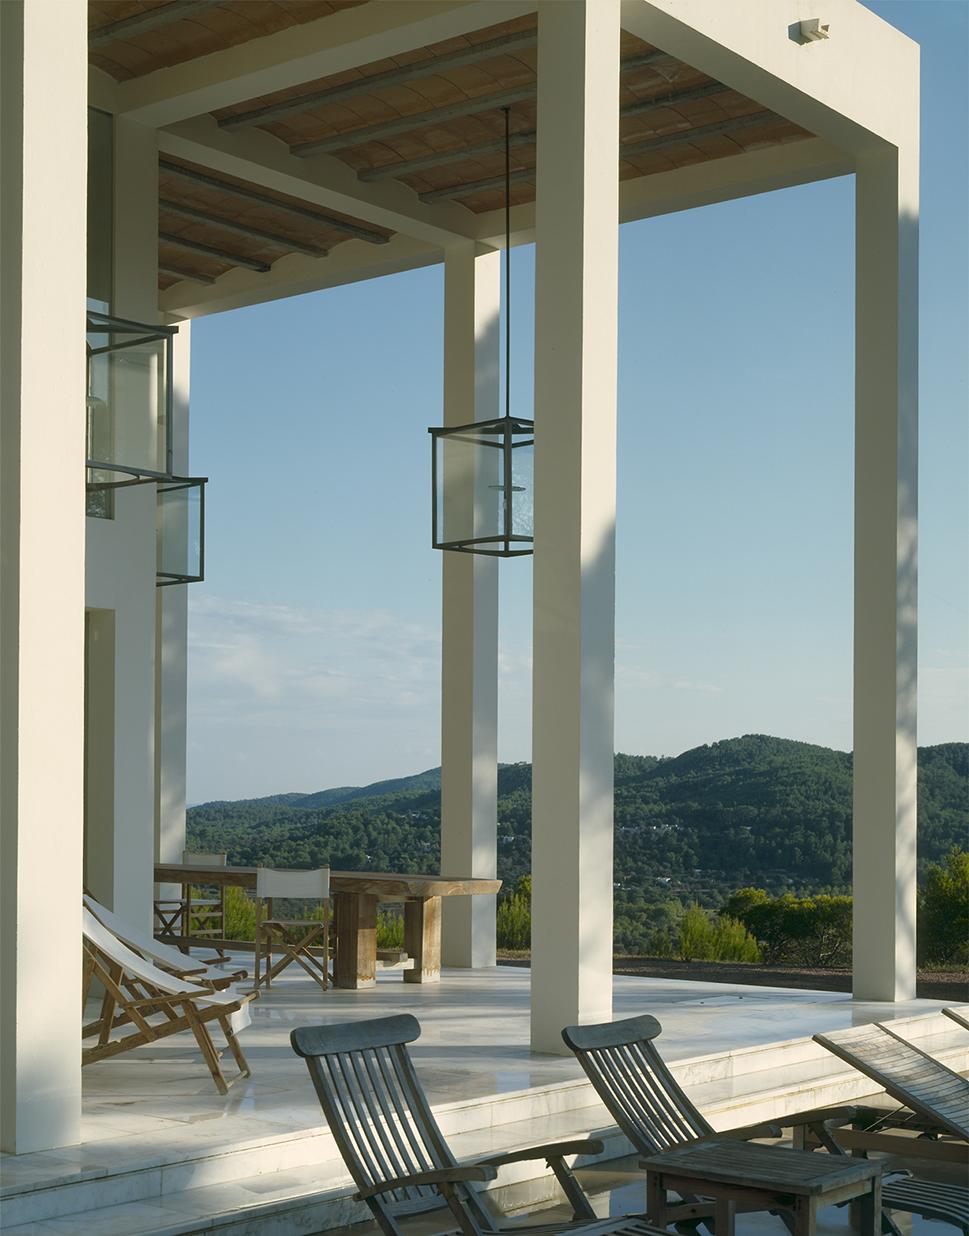 2 Morna Valley, Ibiza - Patio